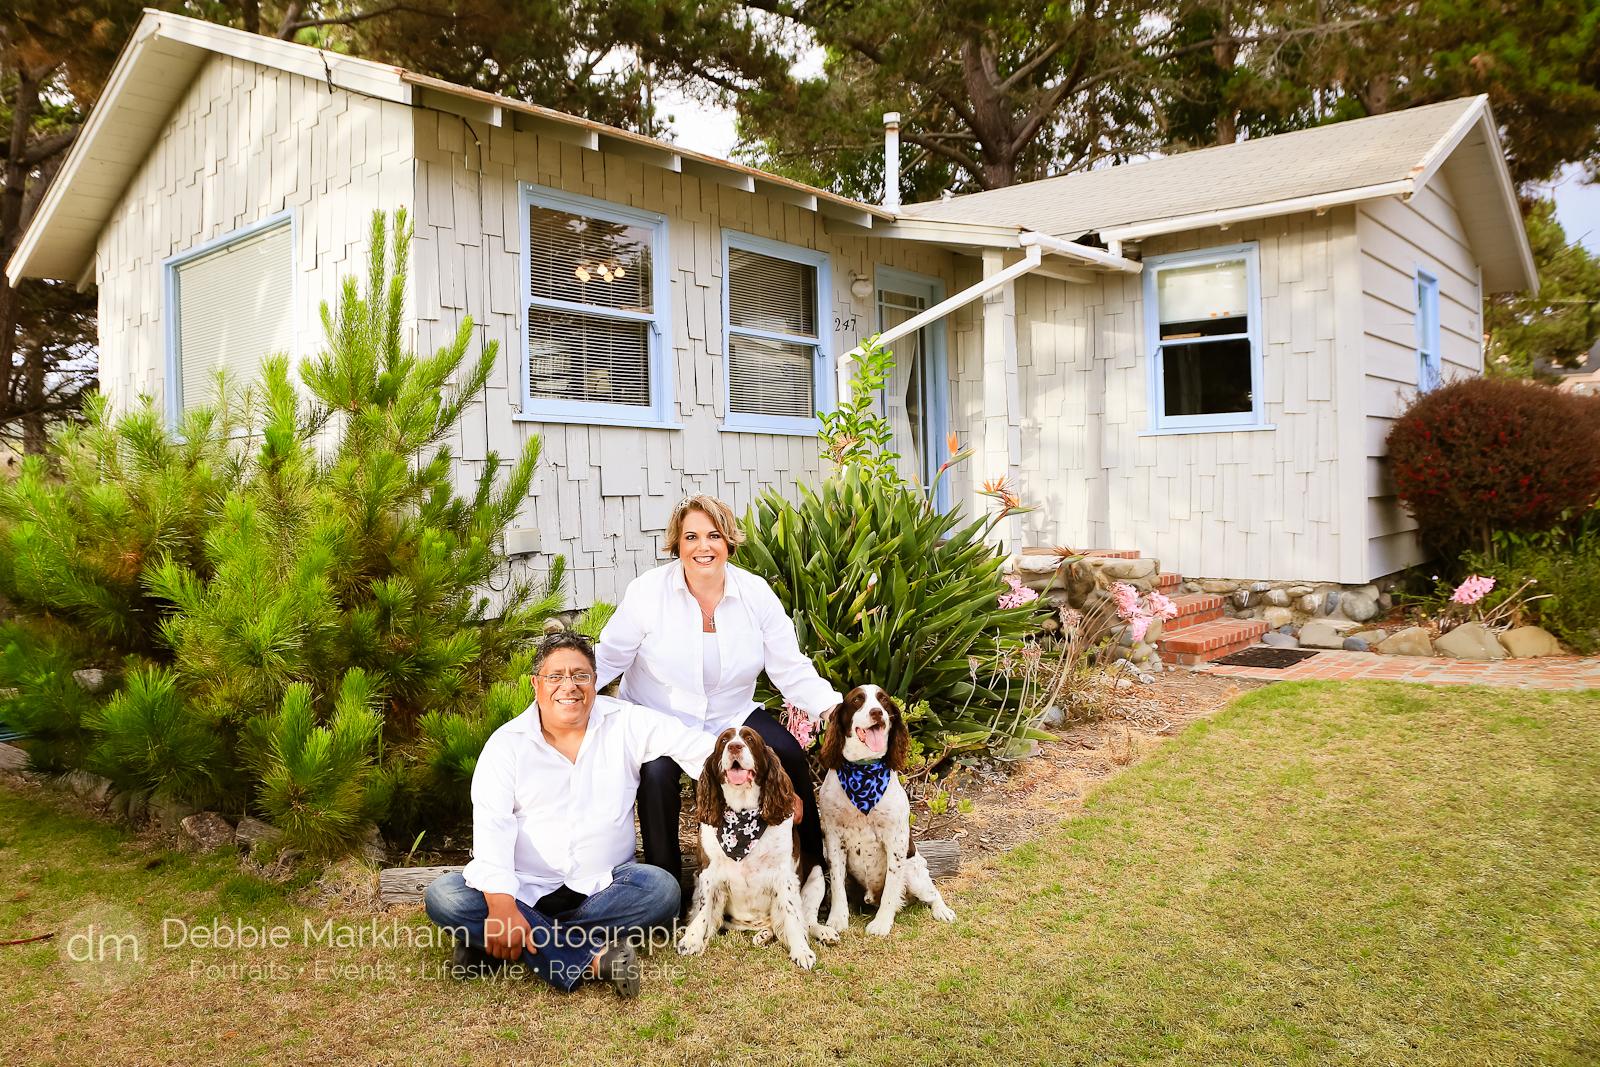 Debbie Markham Photography+Pet Photographer+Portraits+Dogs+Central Coast+San Simeon+Cambria+California-3717